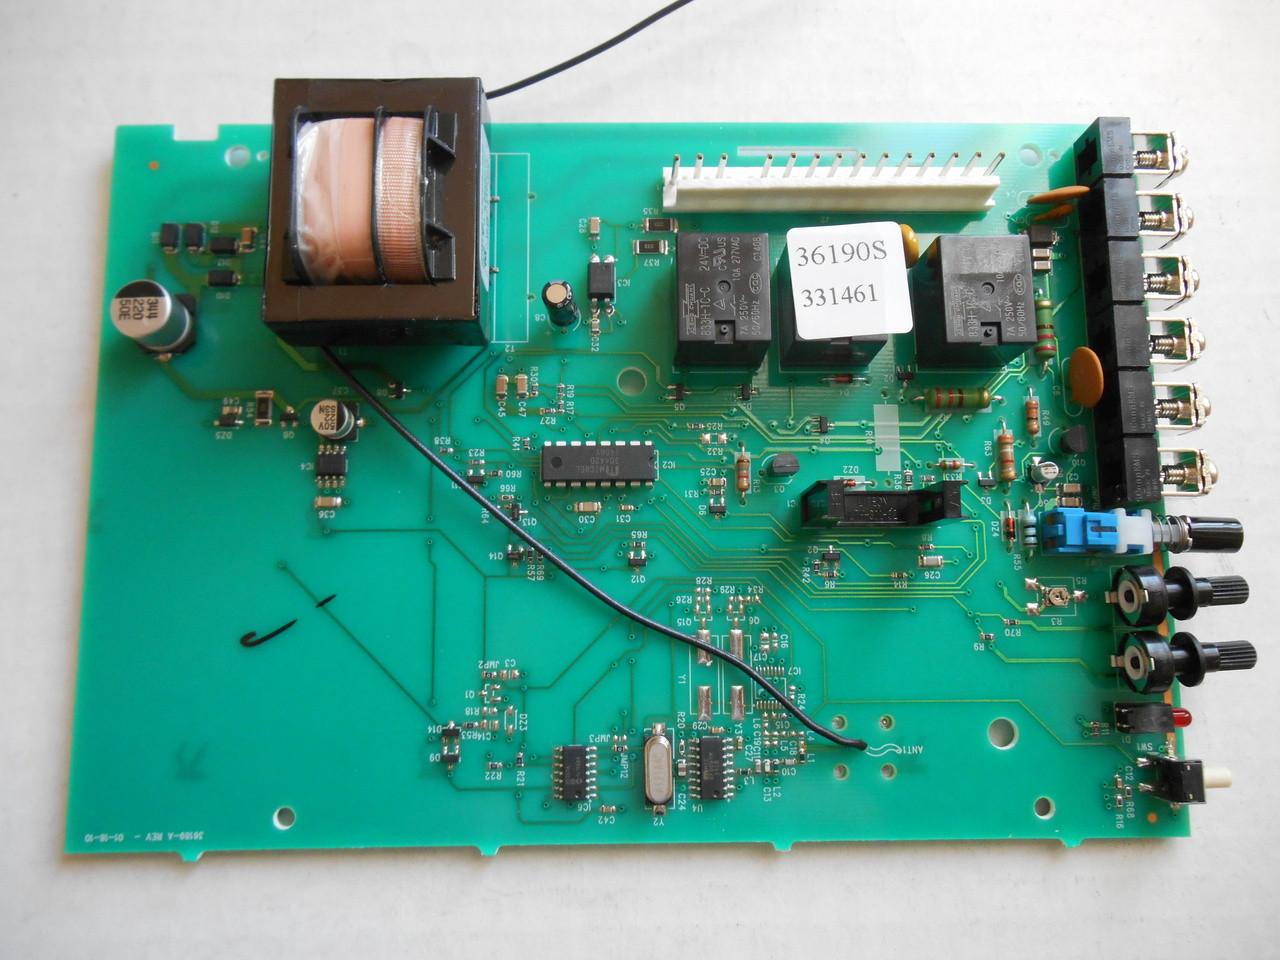 medium resolution of circuit board genie chainglide 20380s overhead door parts online genie pro max capacitor genie pro max circuit board wiring diagram